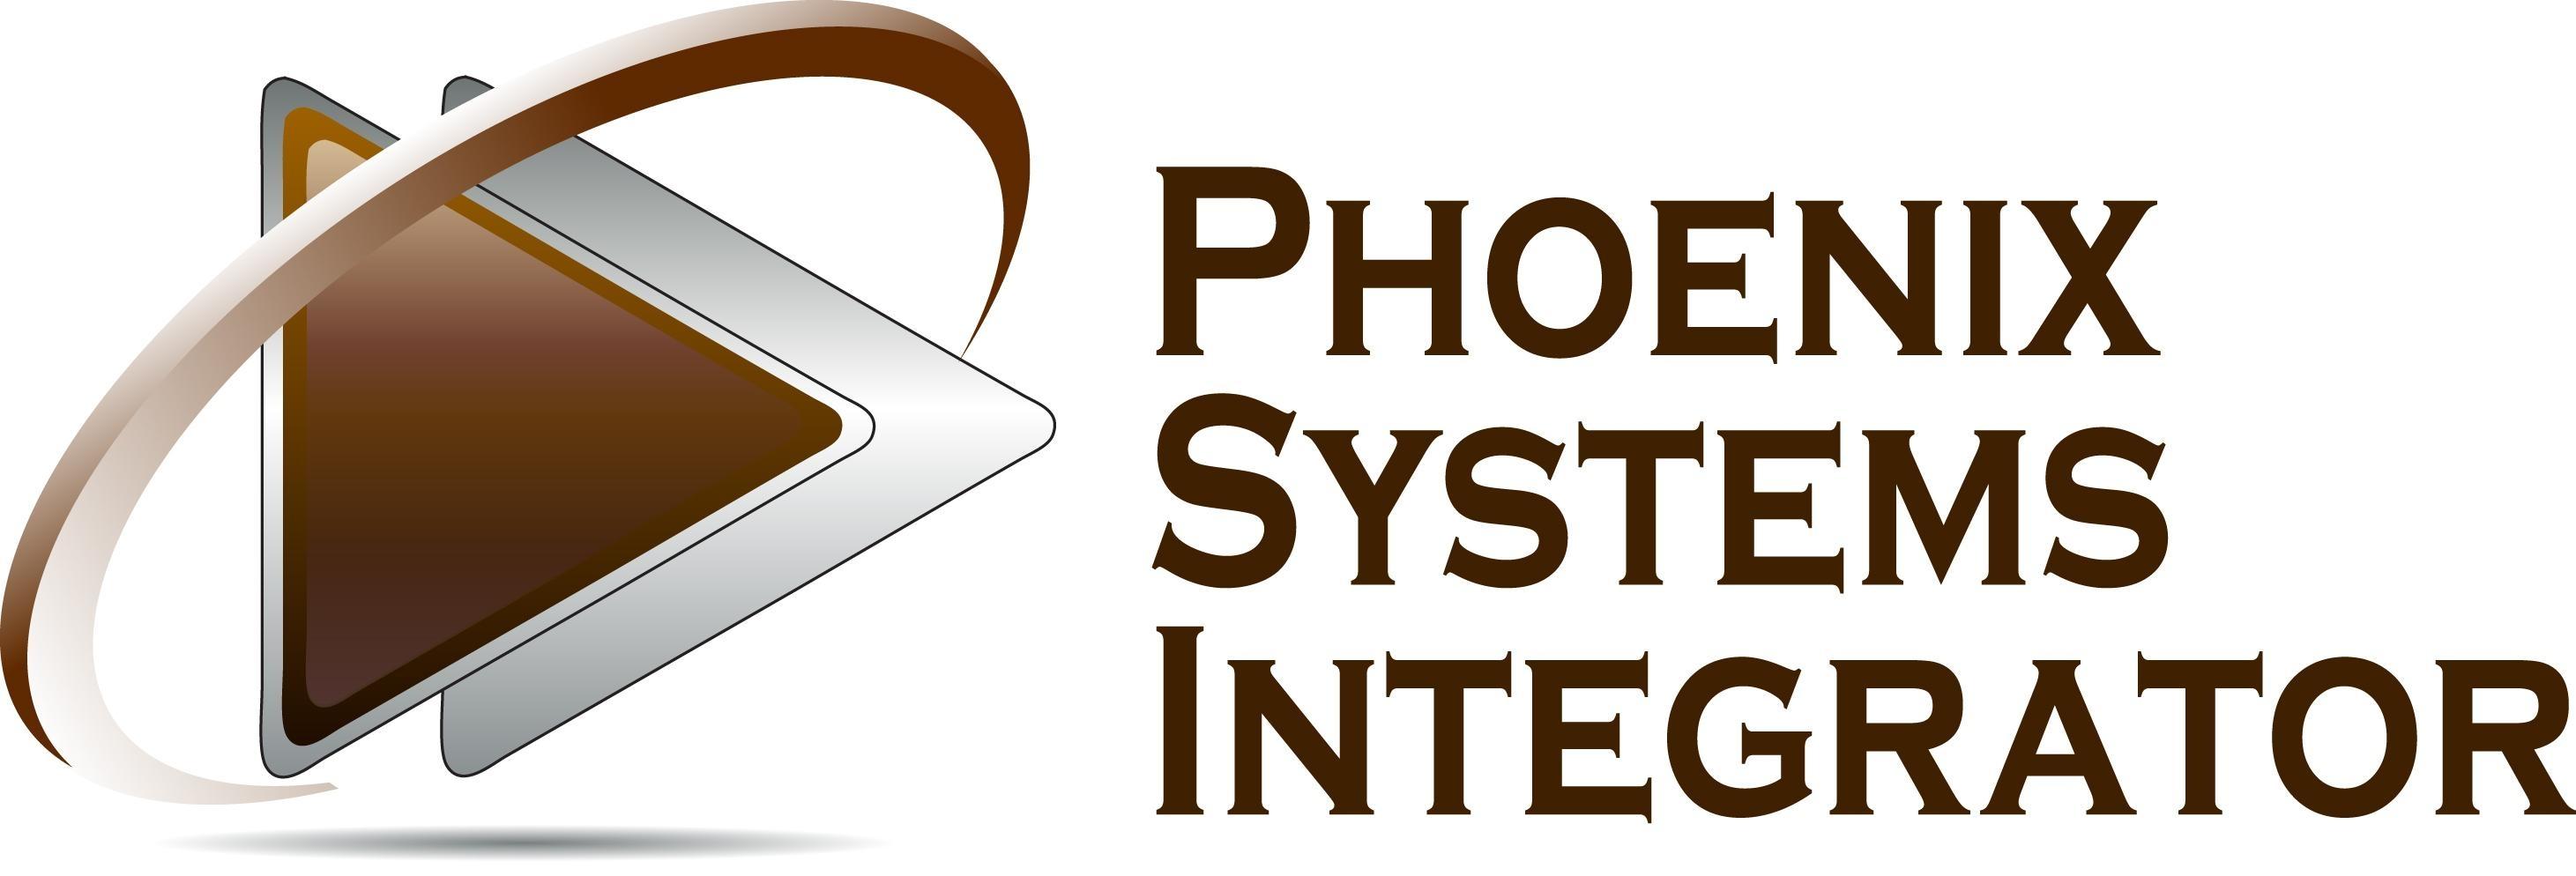 Phoenix Systems Integrator Inc.